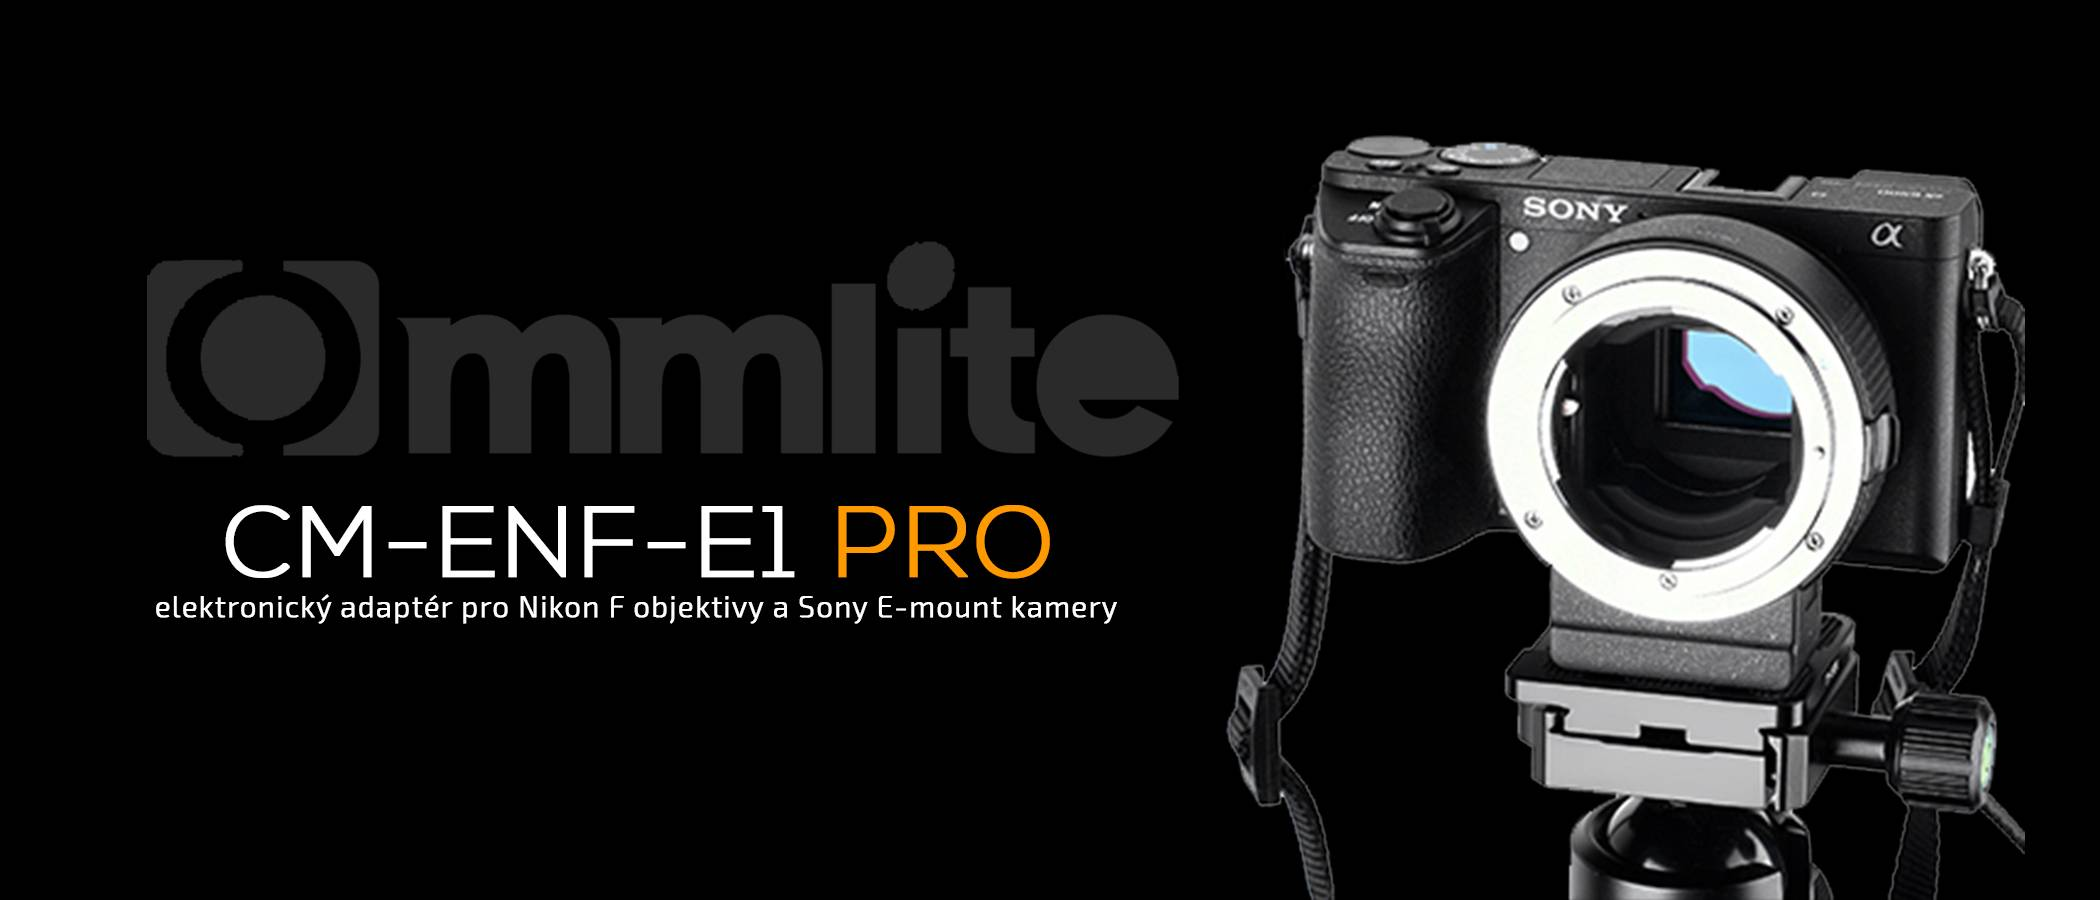 film-technika-commlite-cm-enf-e1-pro